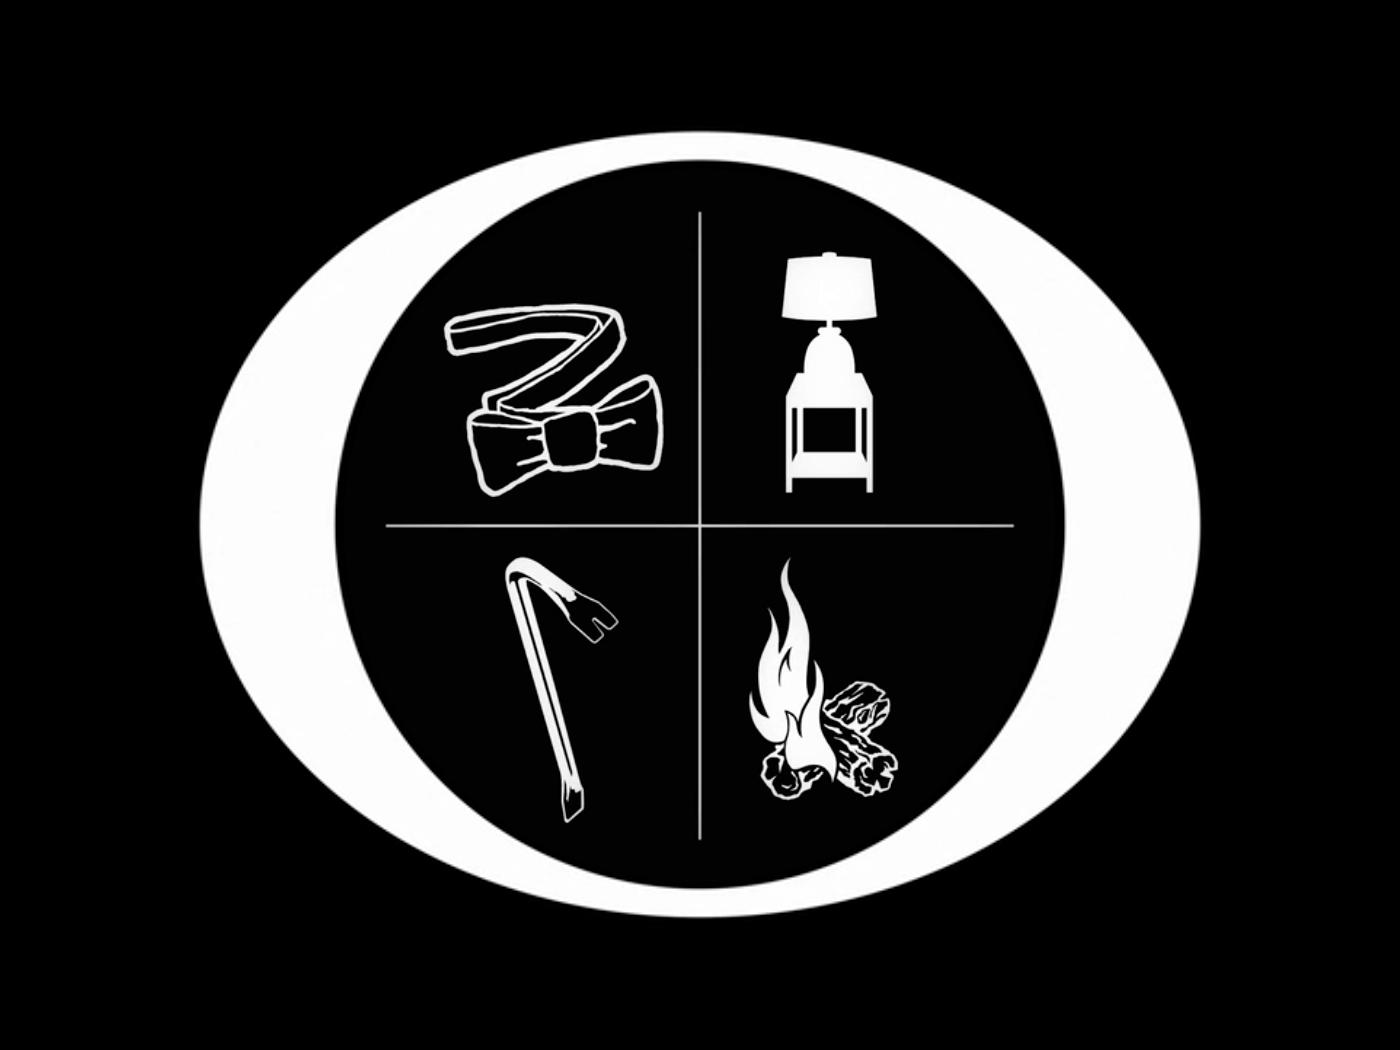 Ozark Season 2 Episode 1 Diagram